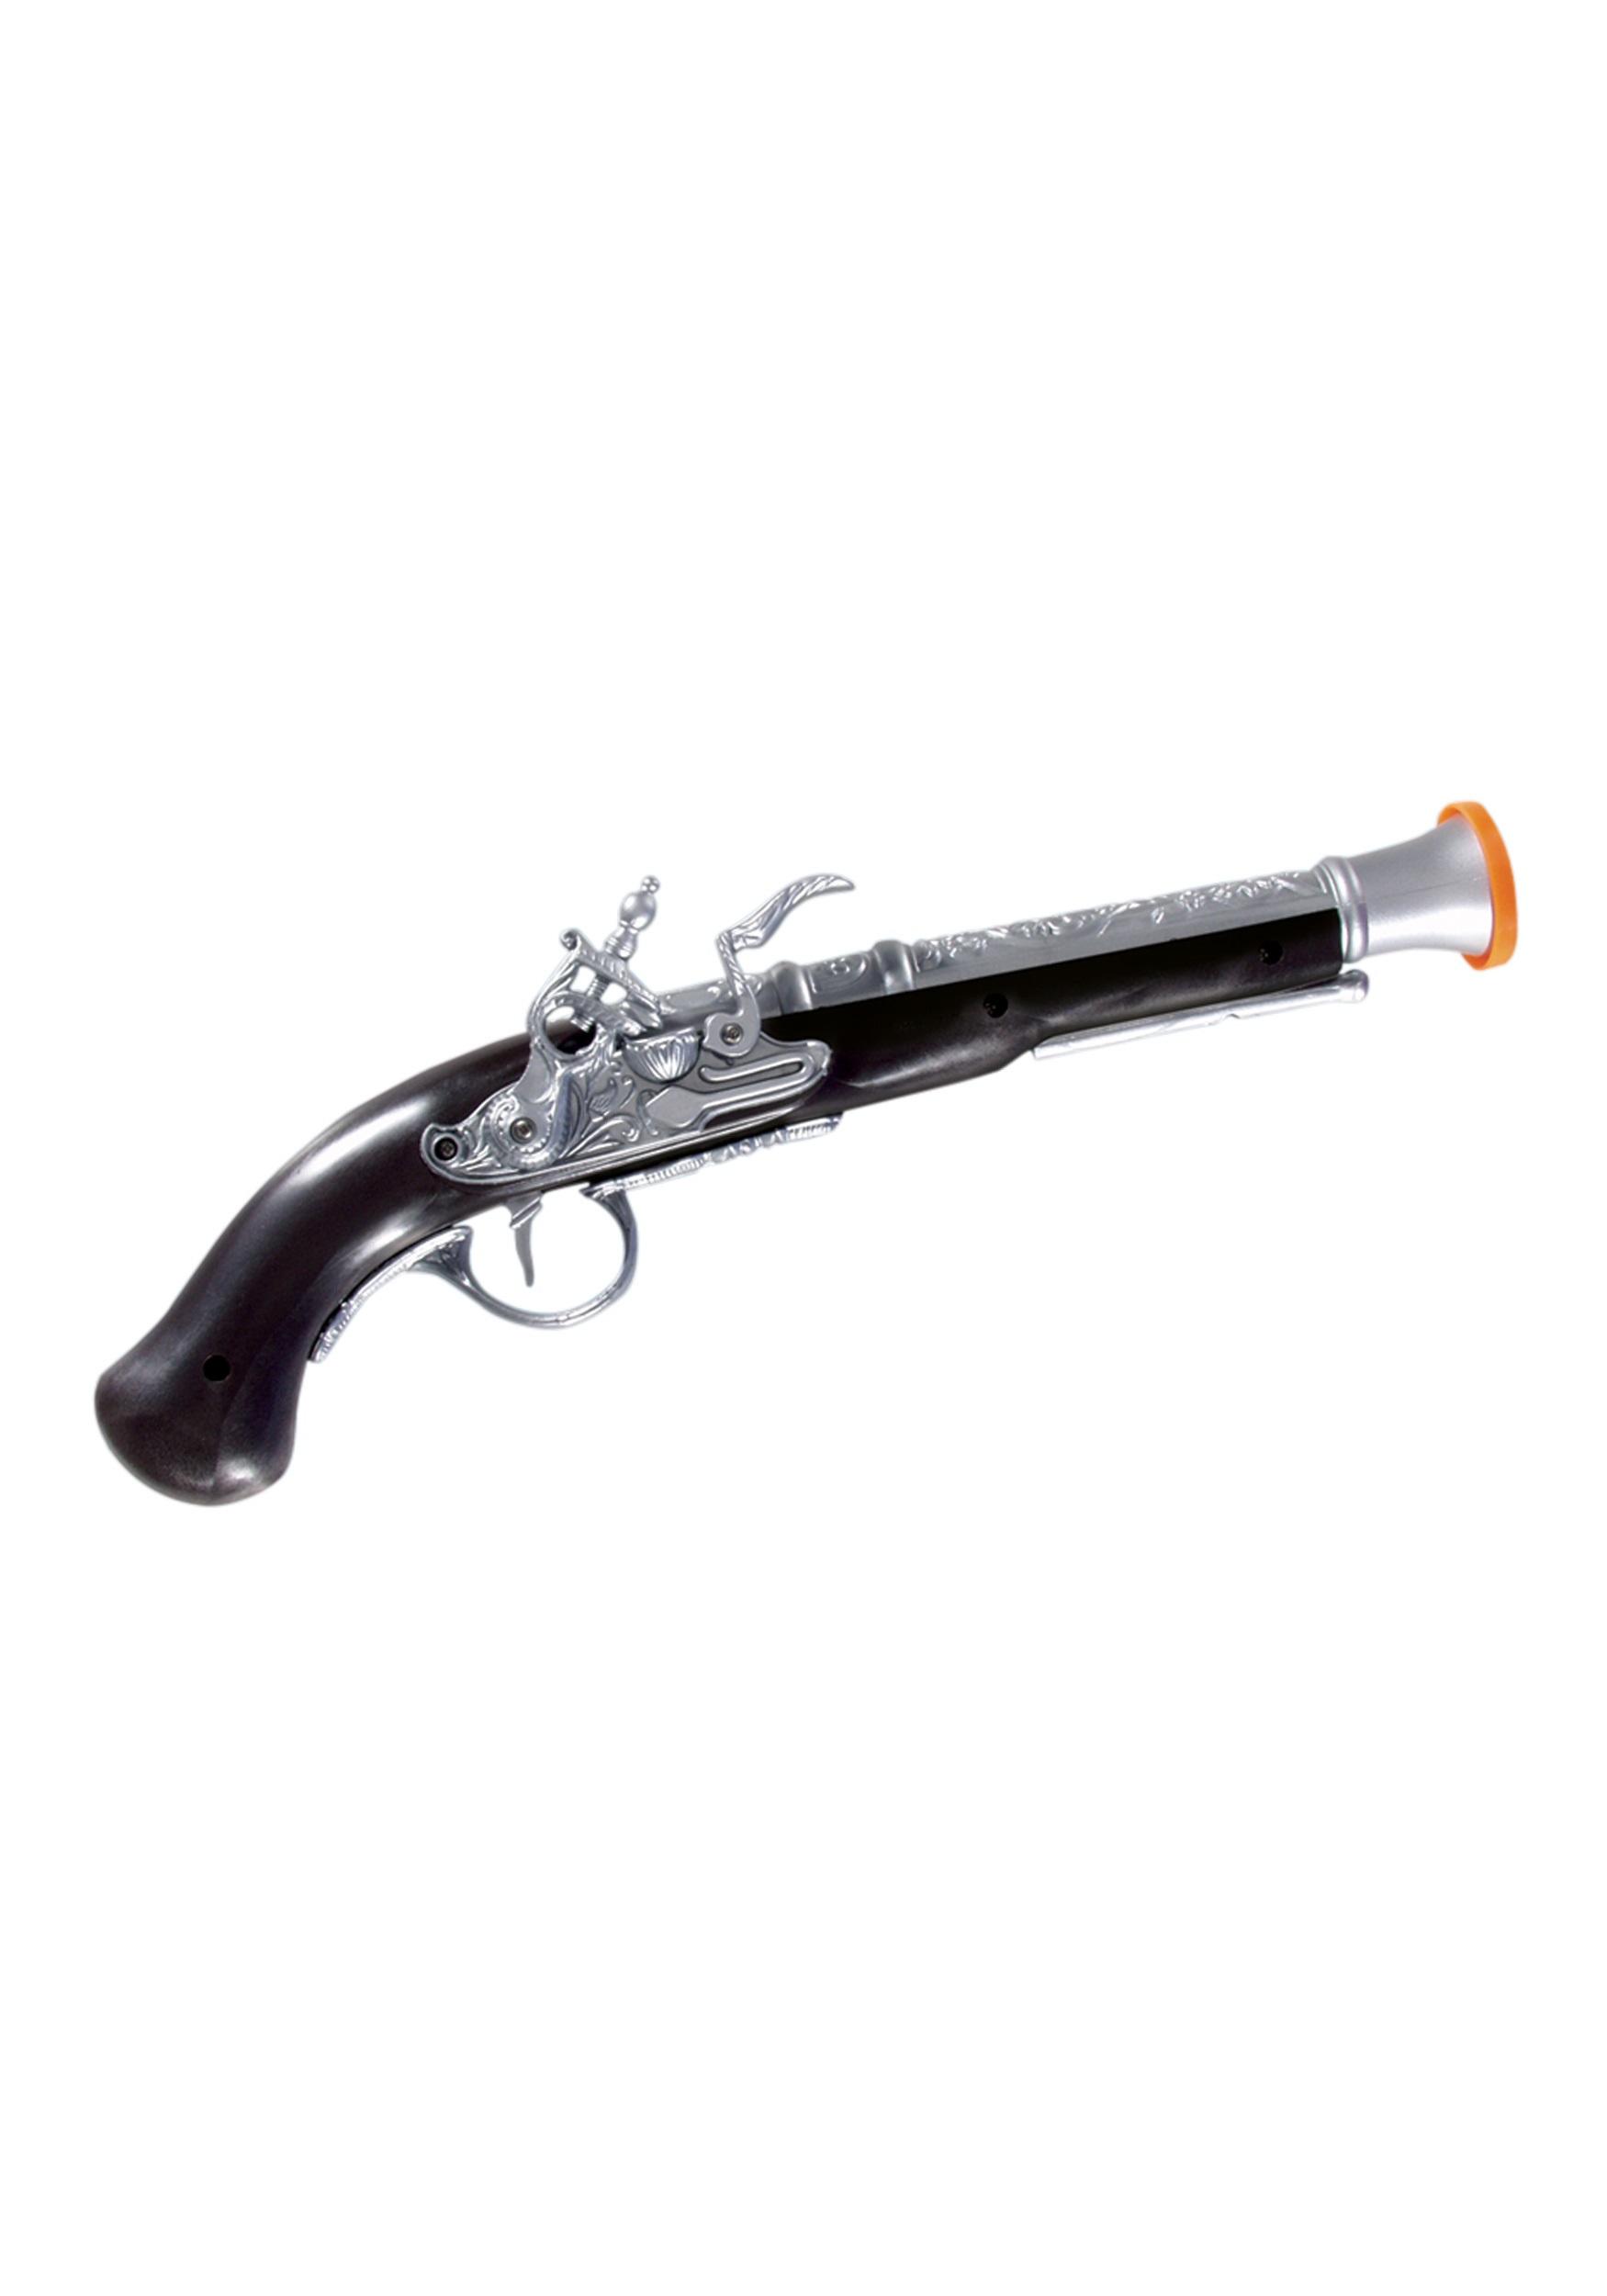 Toy Pirate Pistol Gun